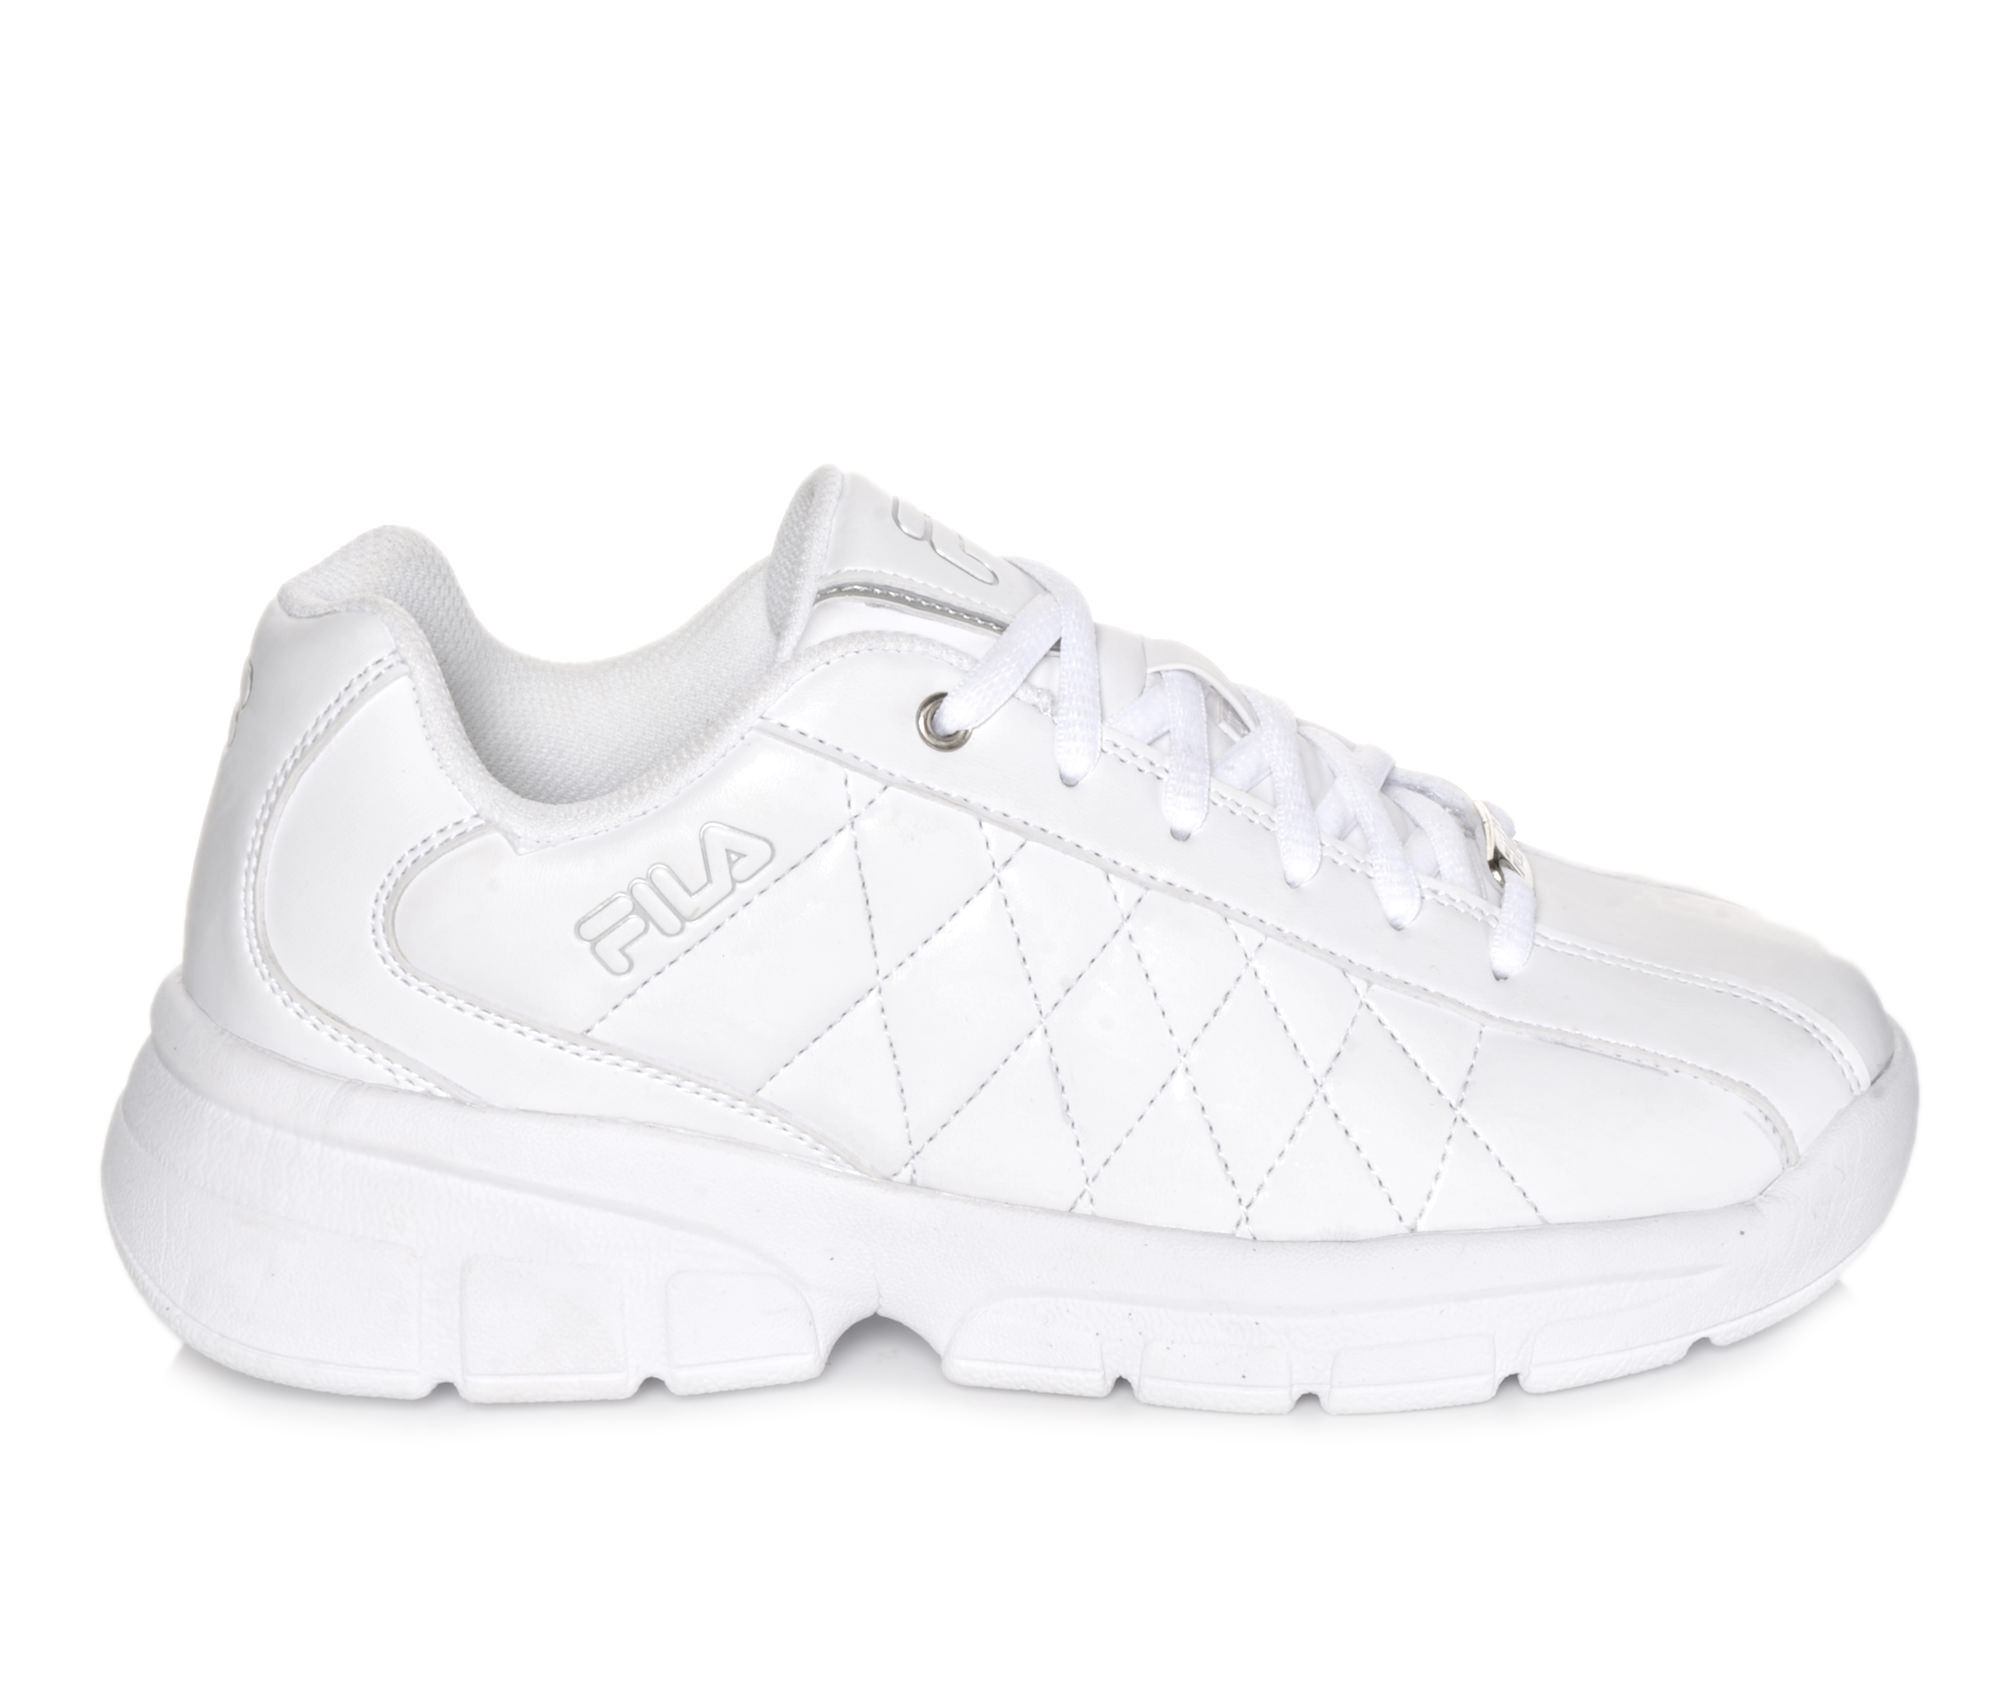 do fila shoes run small or big it matters